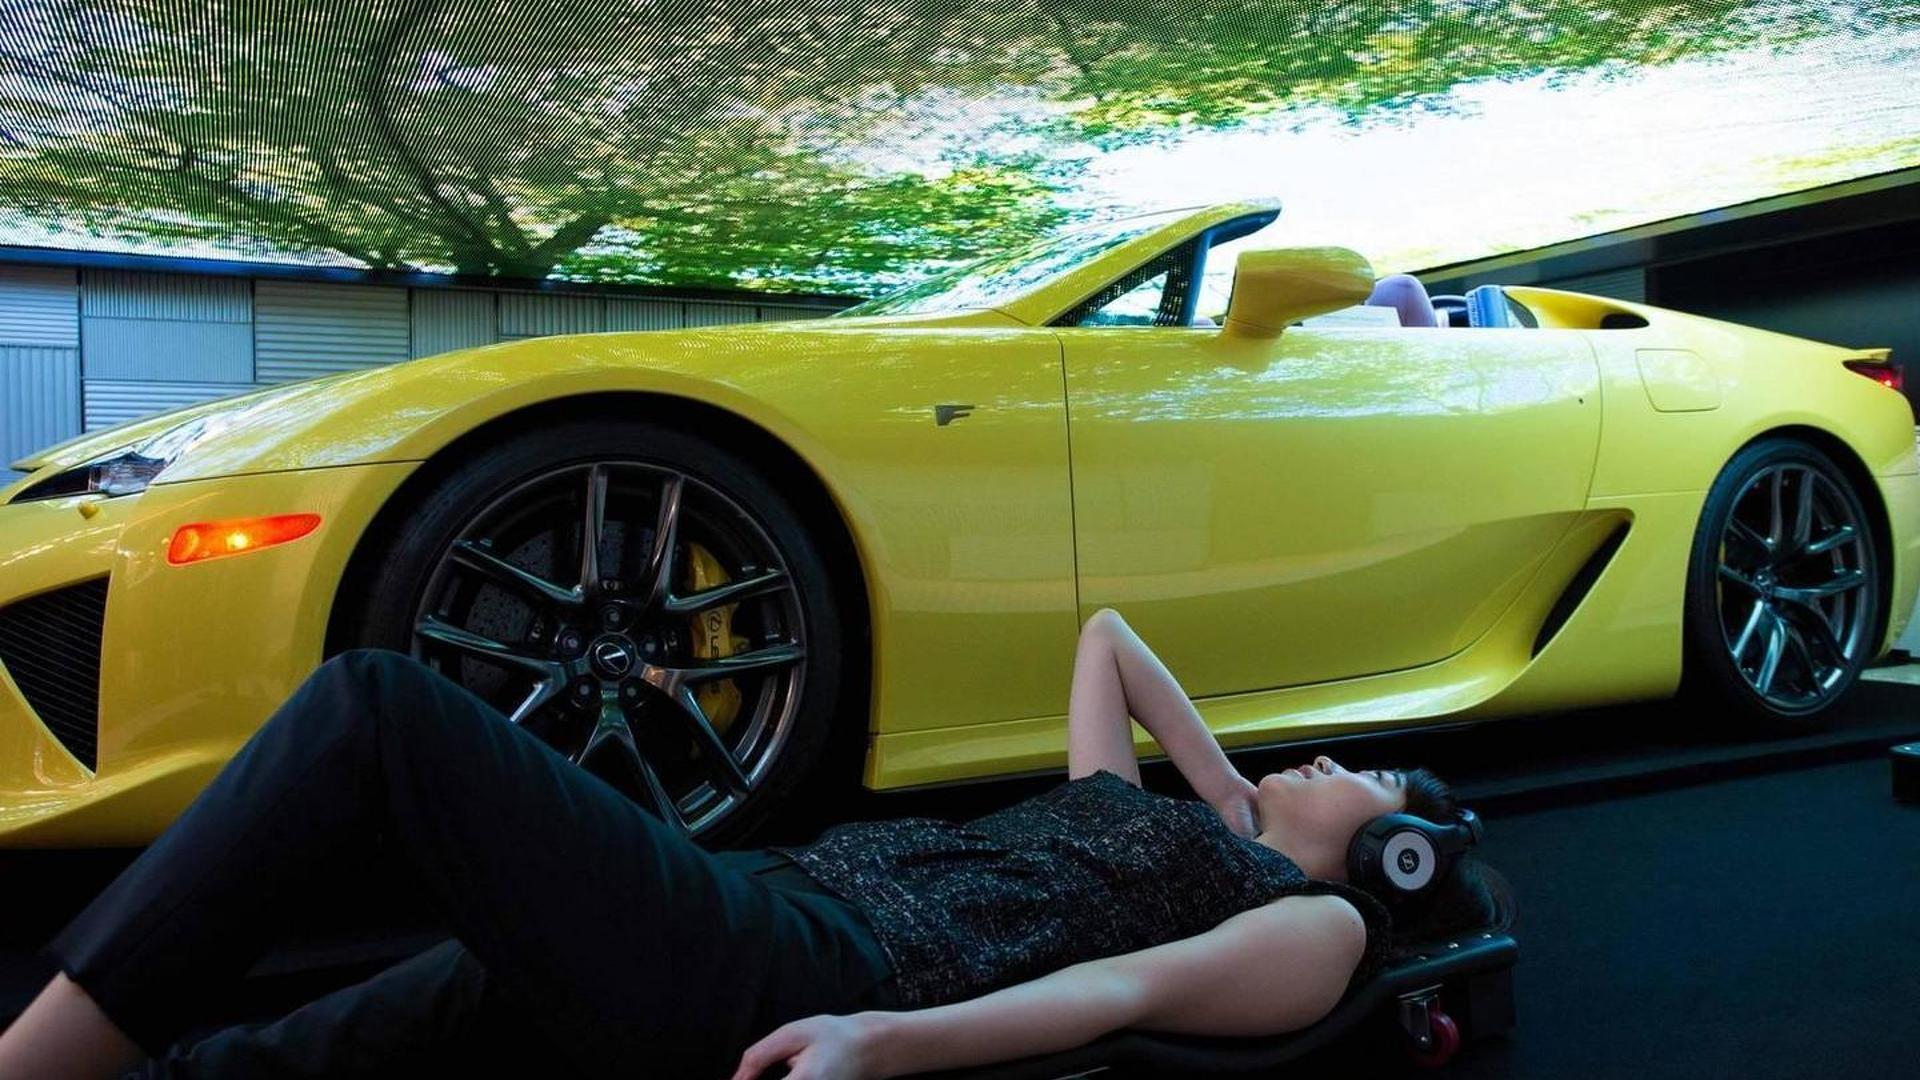 https://icdn-1.motor1.com/images/mgl/Vng4M/s1/2015-545867-lexus-lfa-roadster-2015-media-ambition-tokyo1.jpg